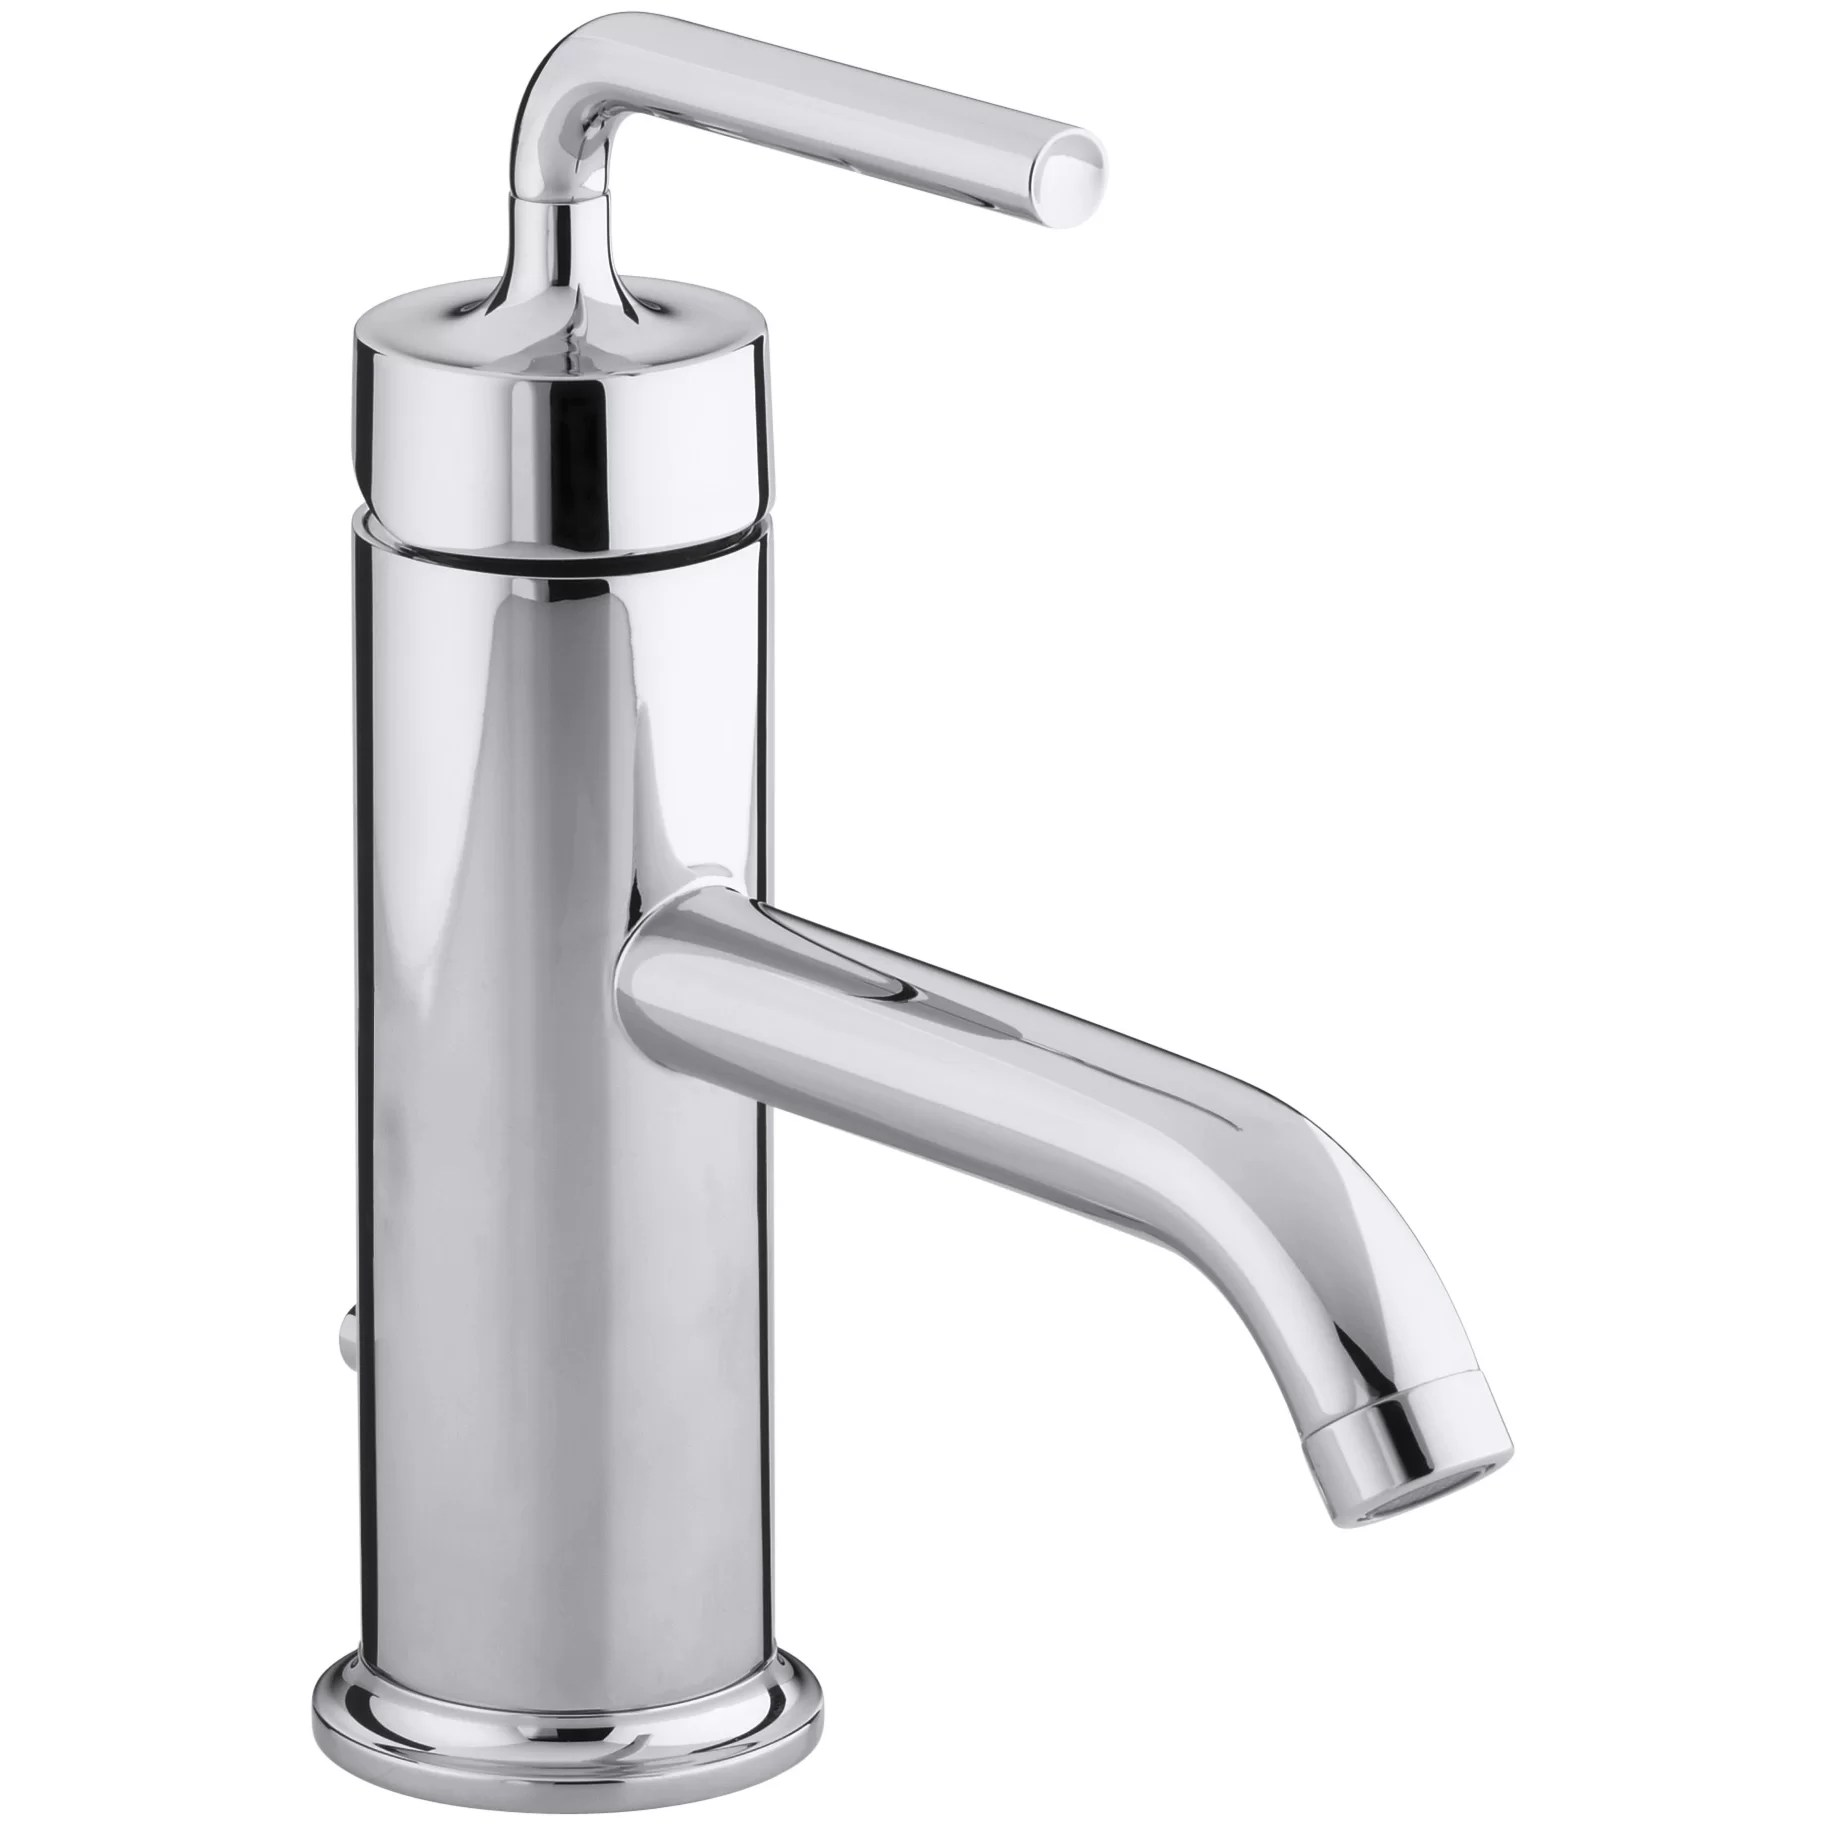 Kohler Purist SingleHole Bathroom Sink Faucet with